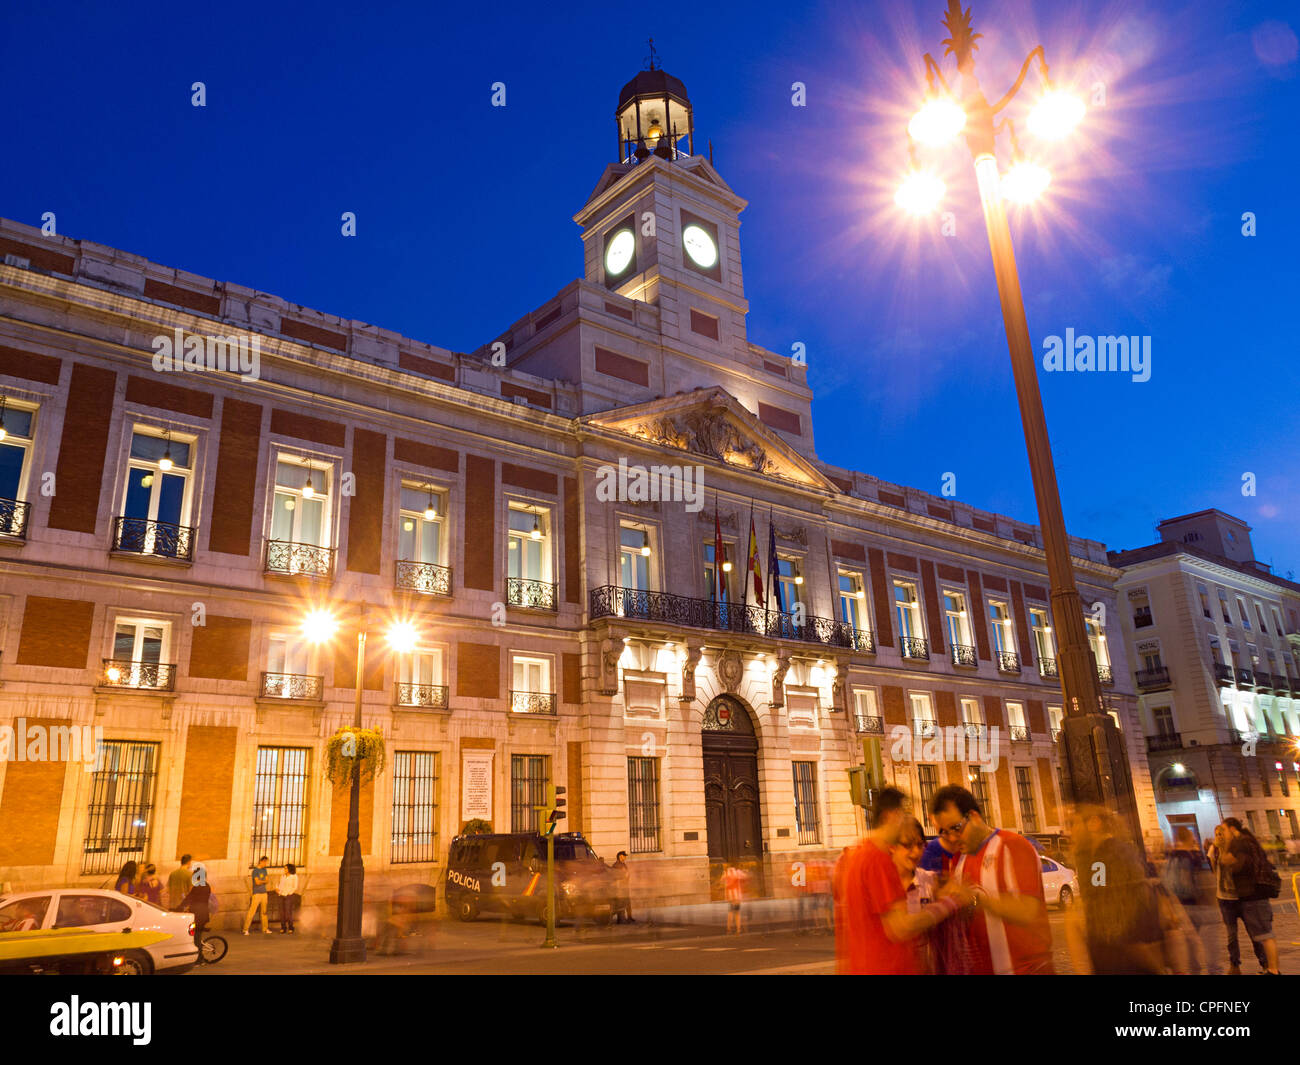 Comunidad de Madrid building in Puerta del Sol square, Madrid, Spain Stock Photo